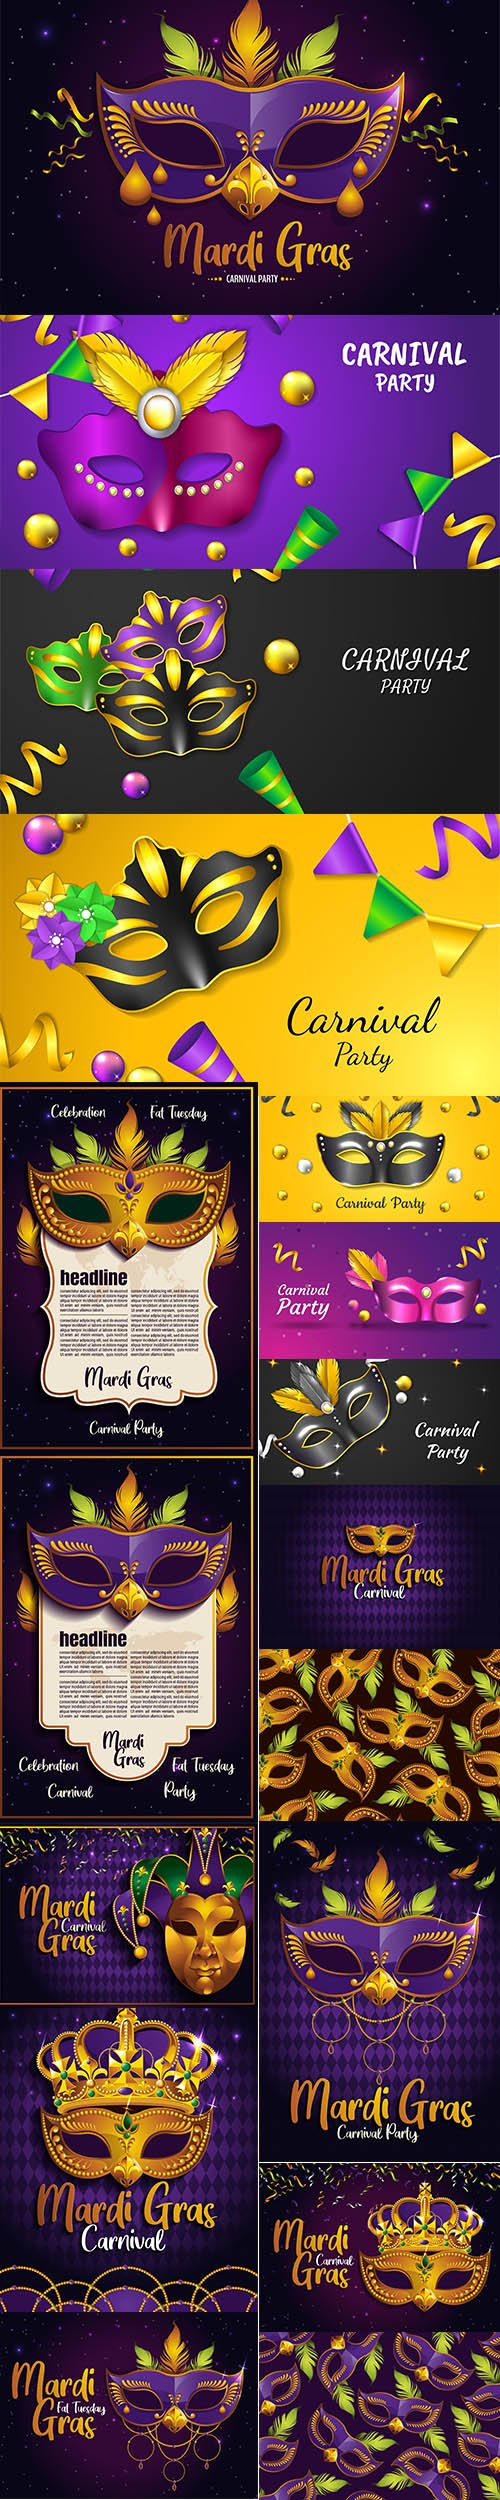 Mardi Gras Carnival Party Illustrations Vector Set